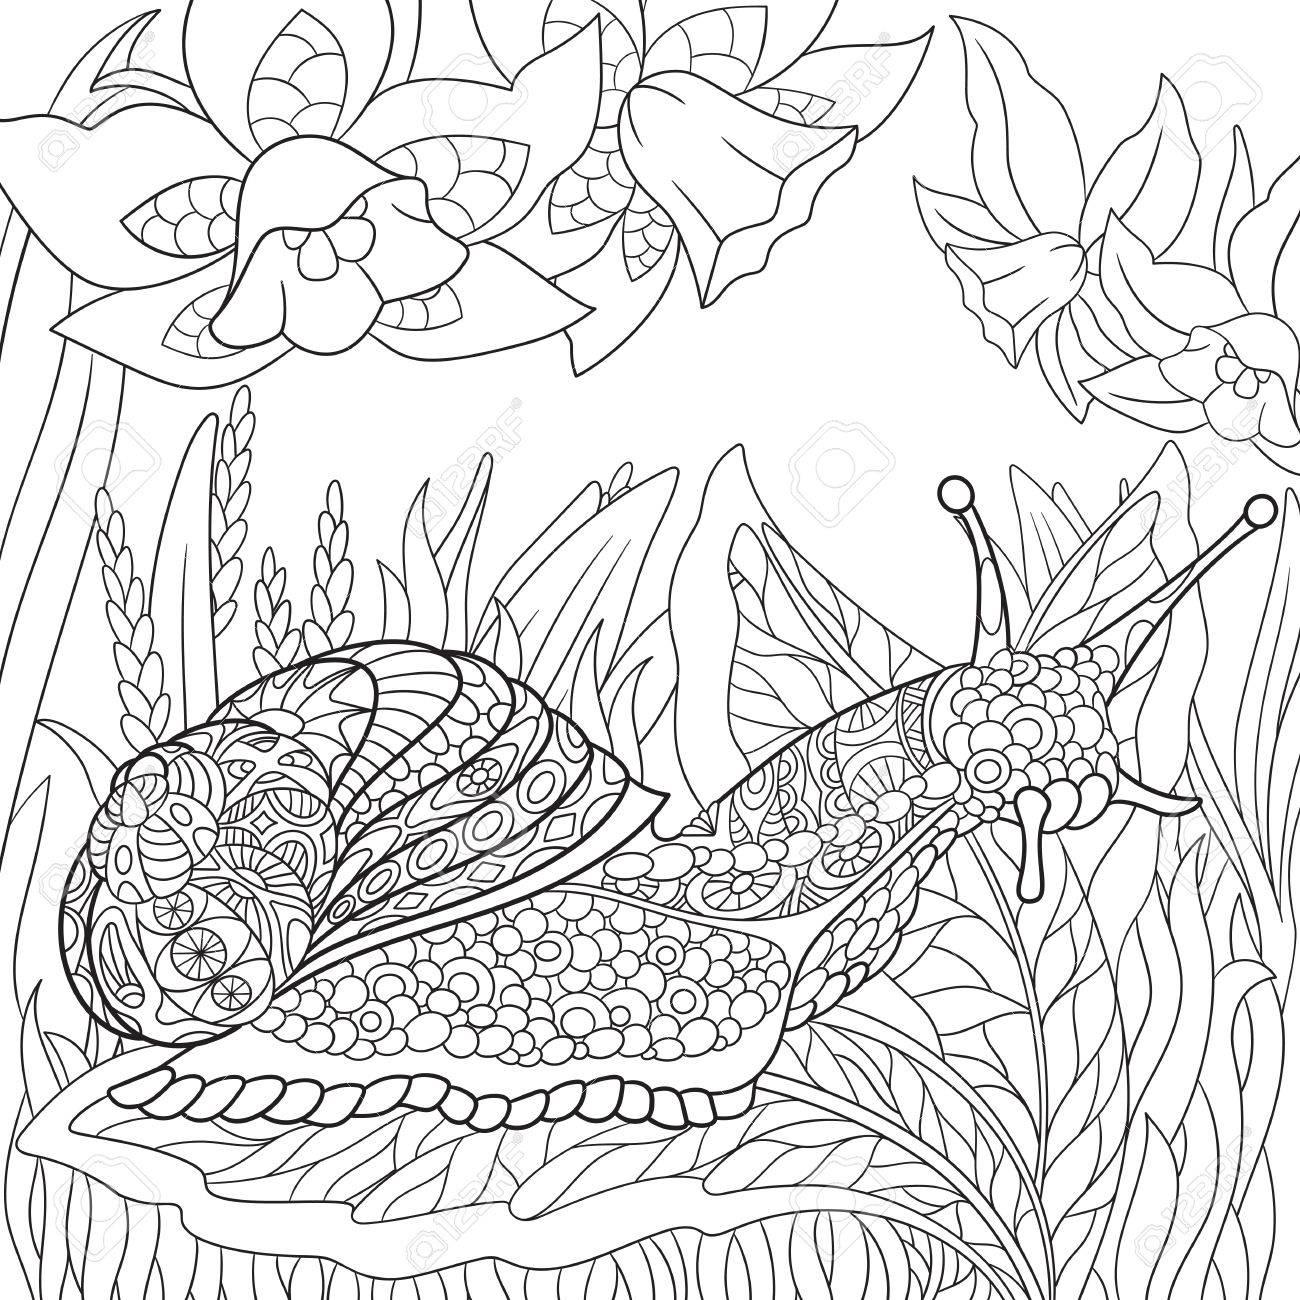 1300x1300 Zentangle Stylized Cartoon Snail Crawling Among Narcissus Flowers